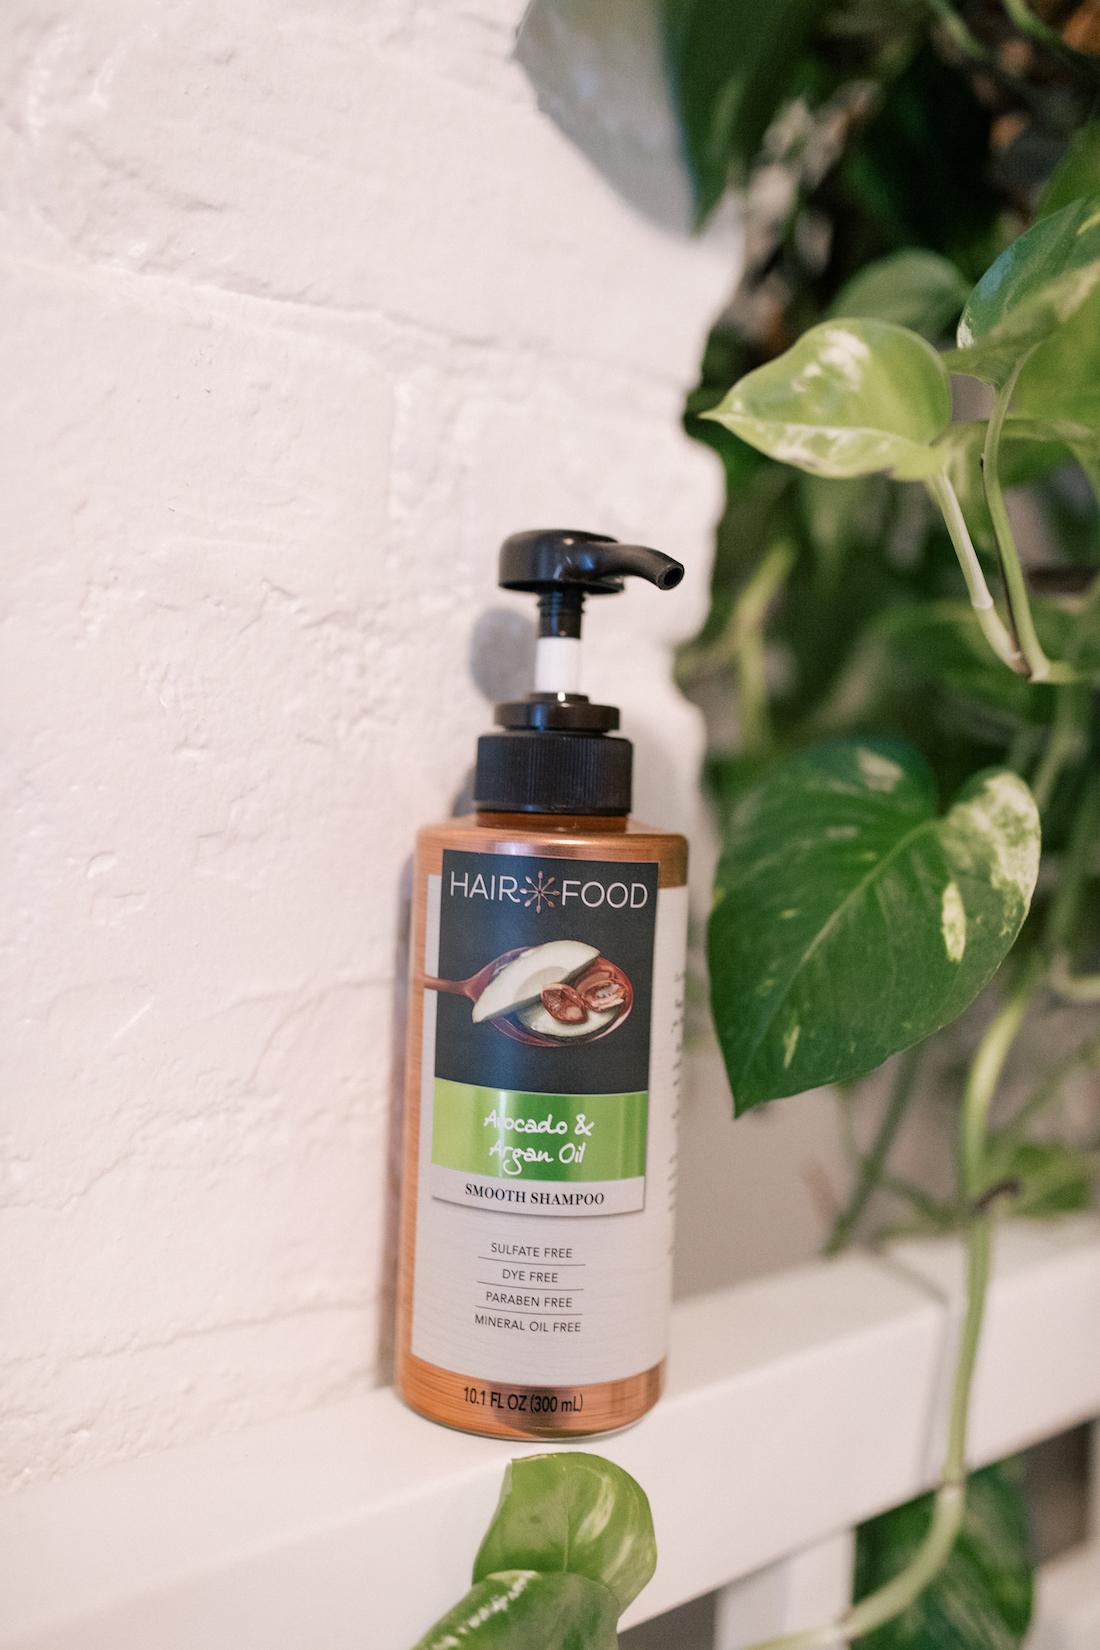 Hair Food's Avocado & Argan Oil Smooth Shampoo